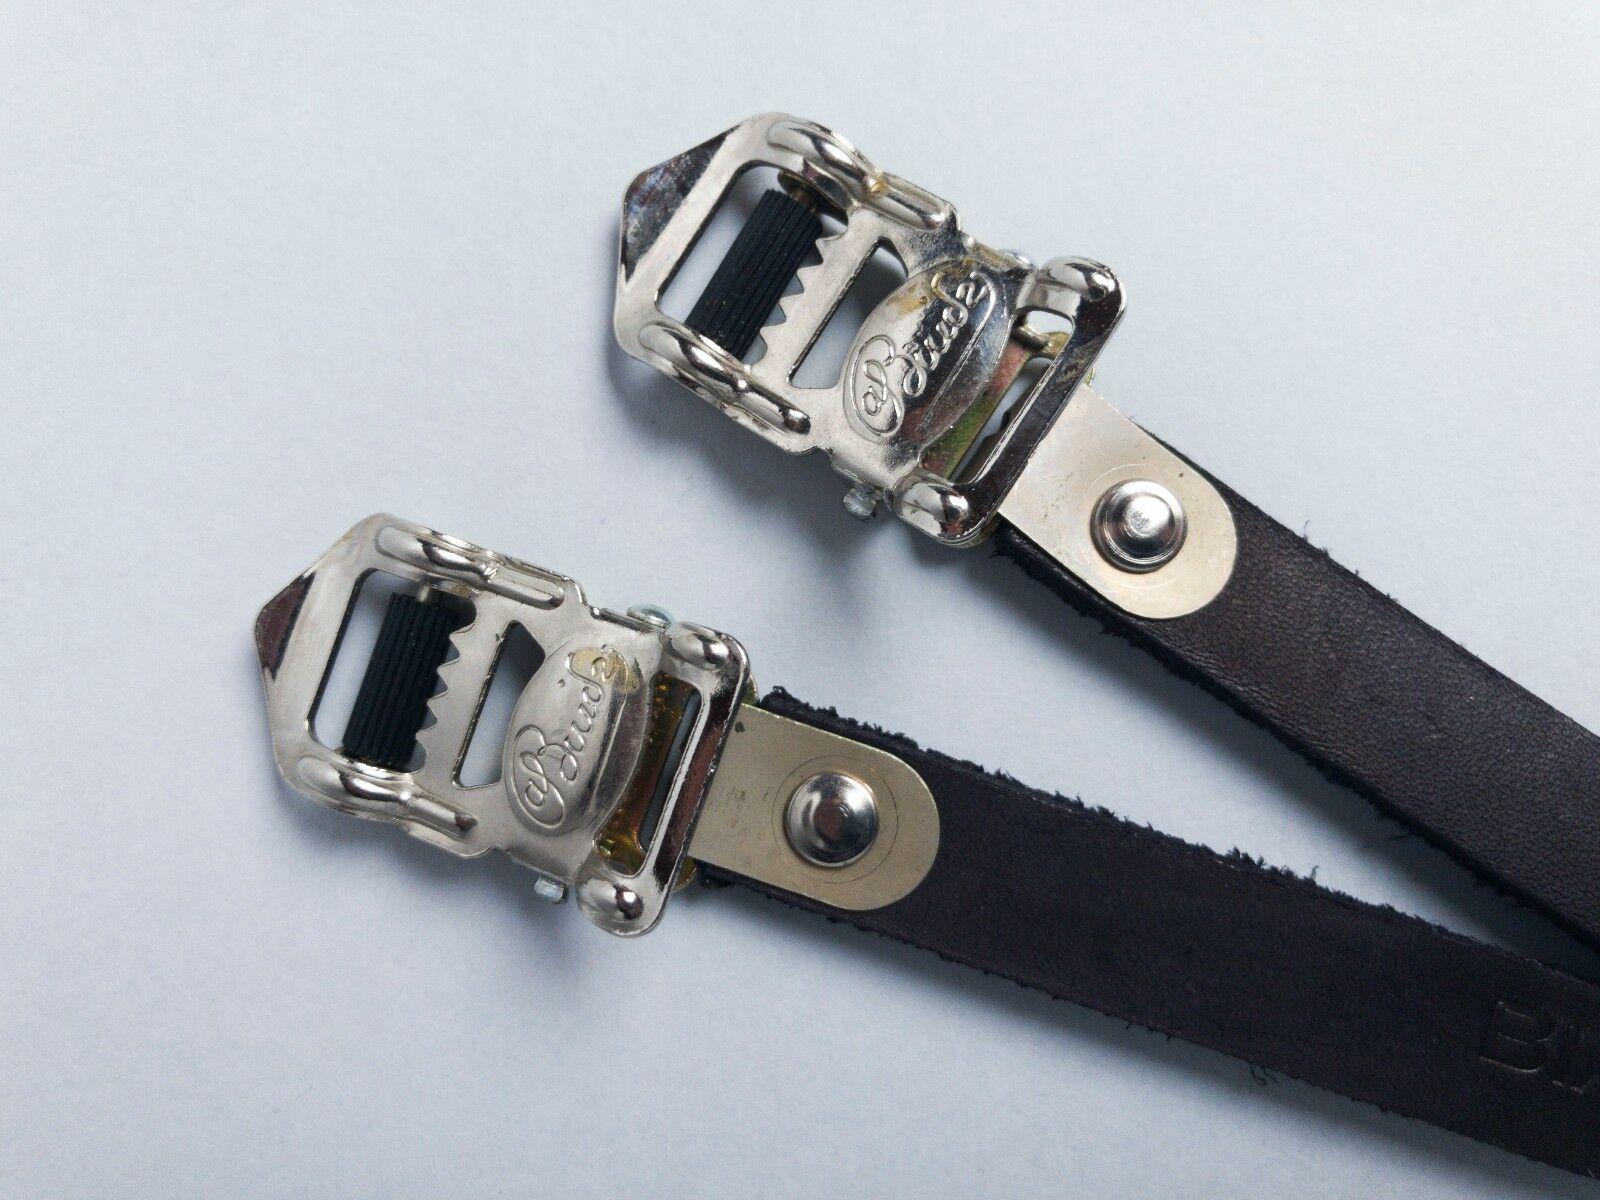 ALFrotO BINDA  CINTURINI FERMAPIEDI NOS GALMOZZI toe straps leather NERI